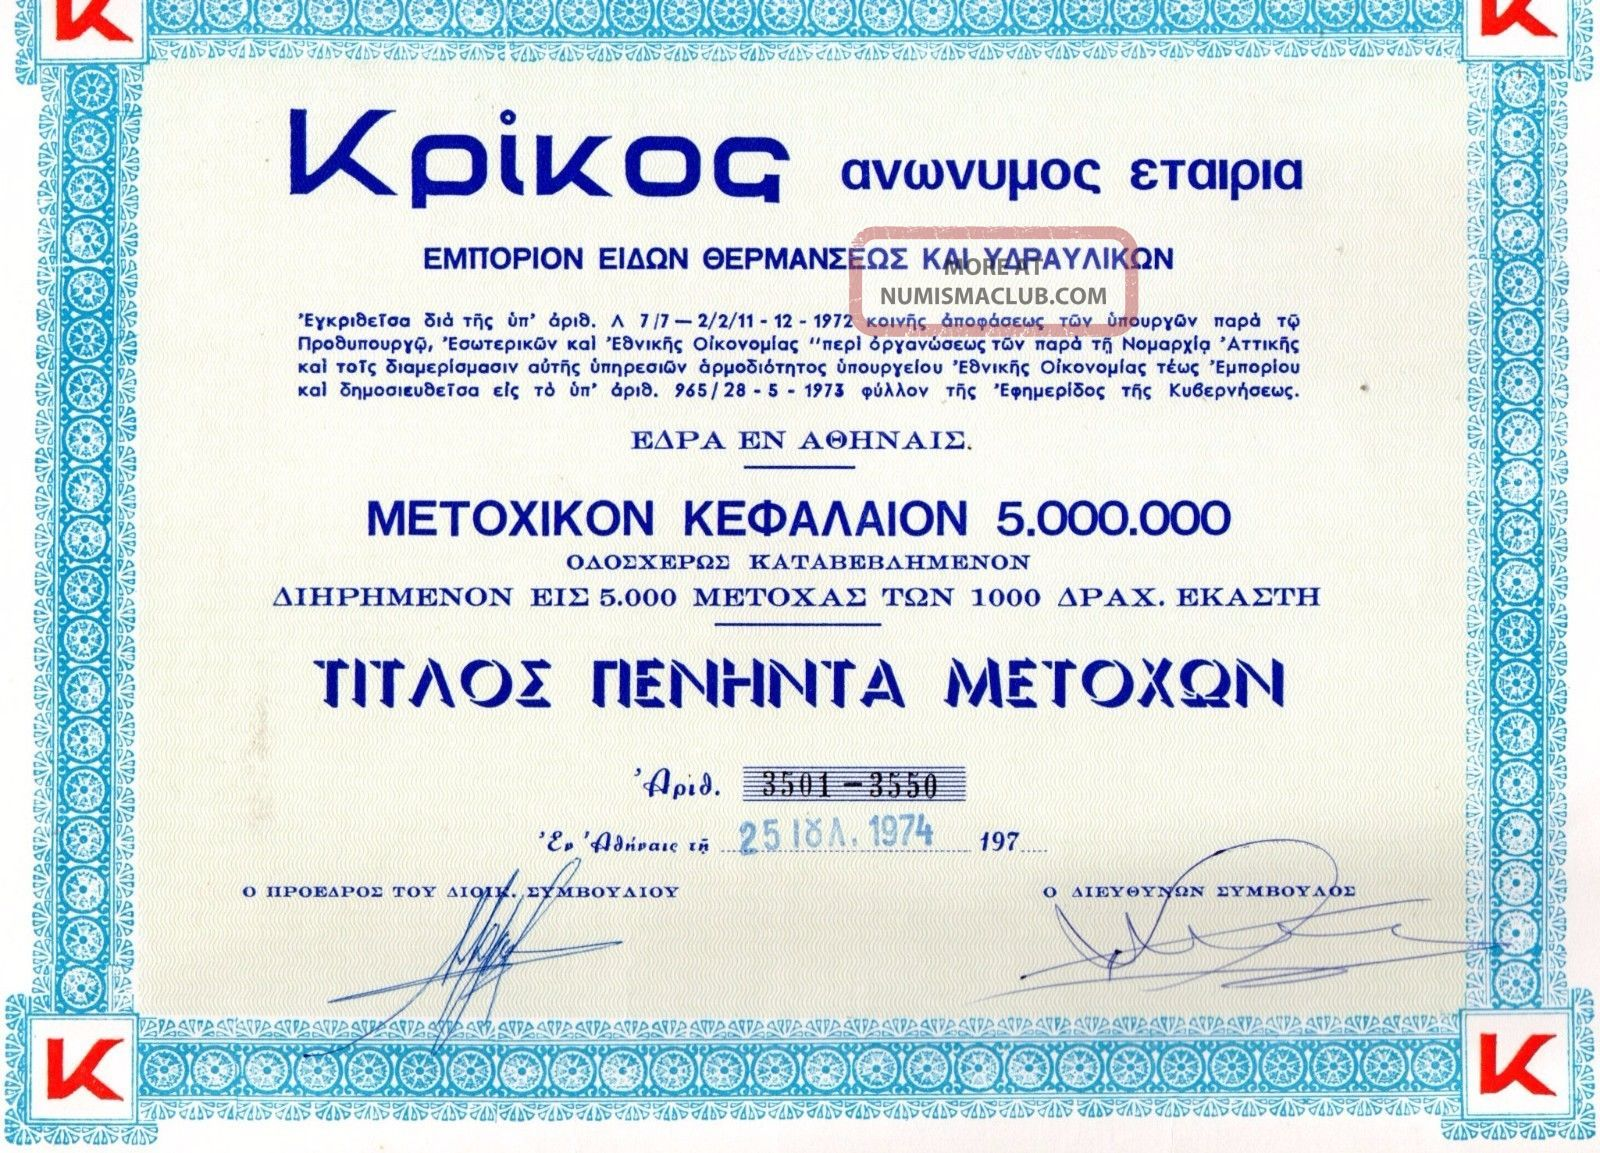 Gr.  Heating,  Hydraulics Co Krikos Title Of 50 Shares Bond Stock Certificate 1974 World photo